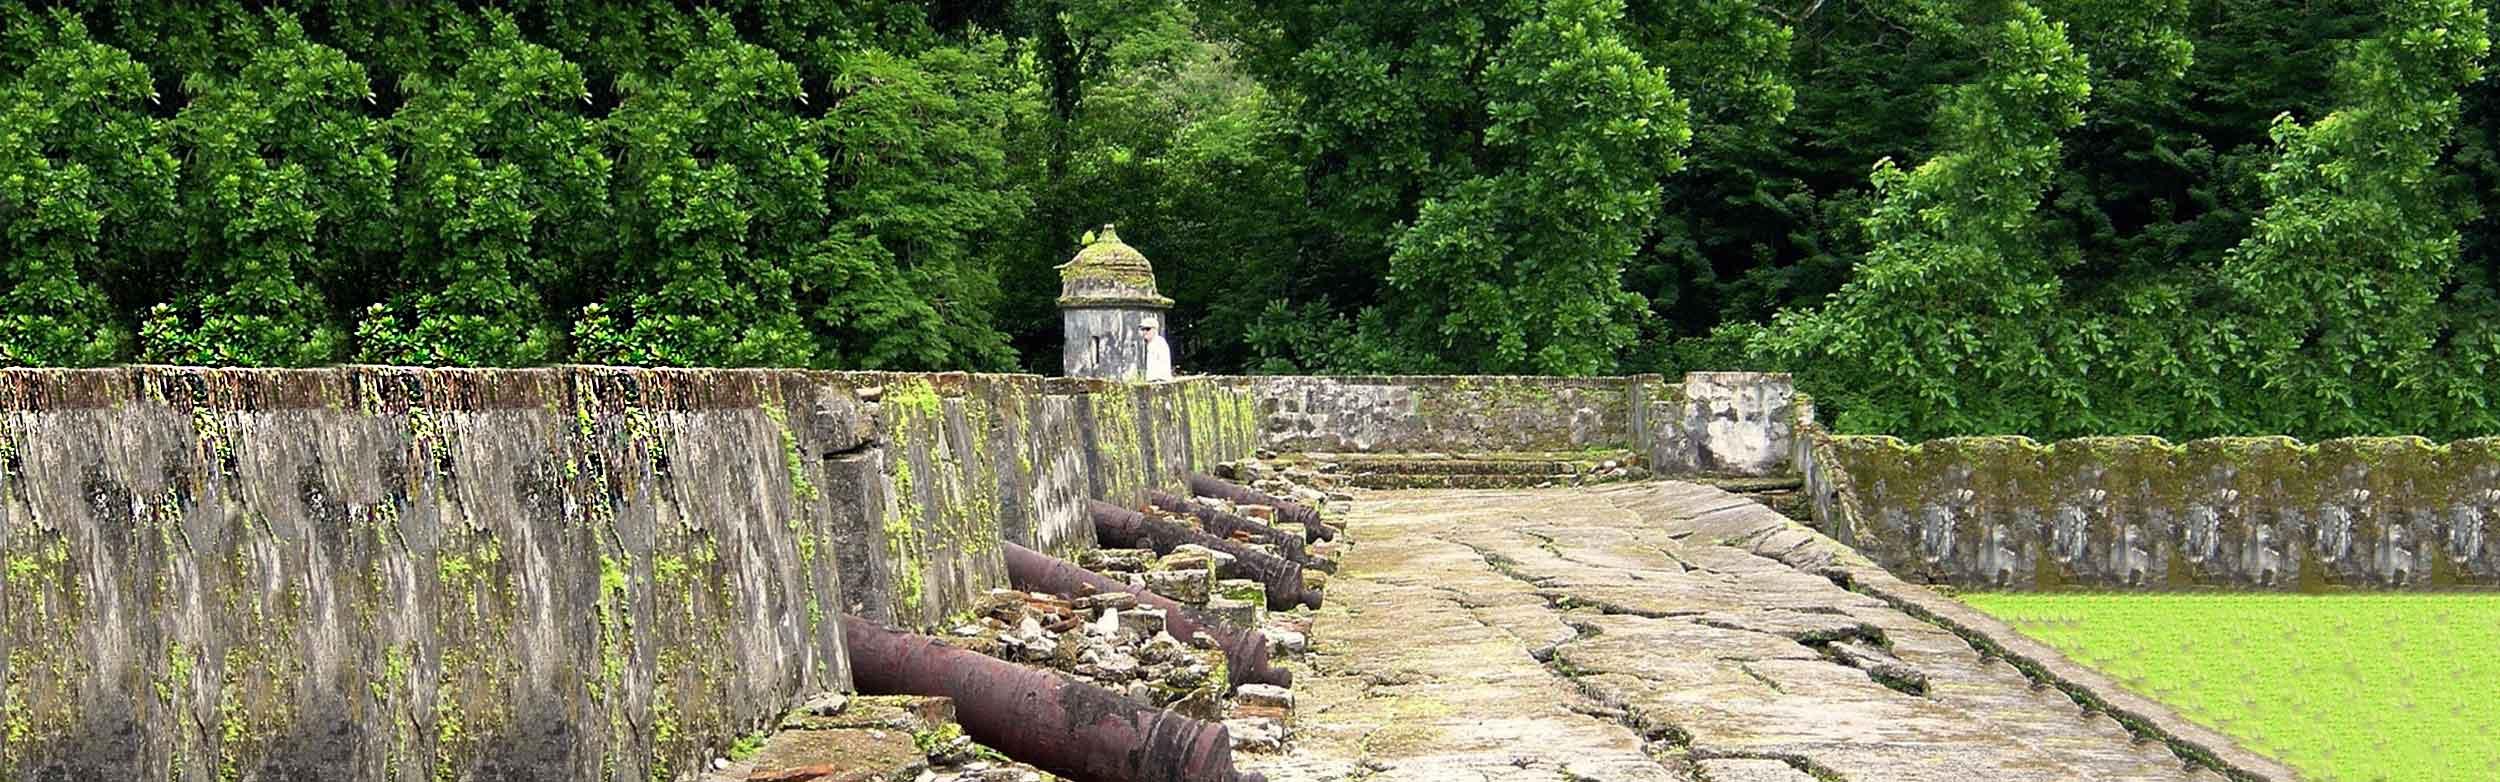 The Pirate Trail: Aguaclara Locks & San Lorenzo